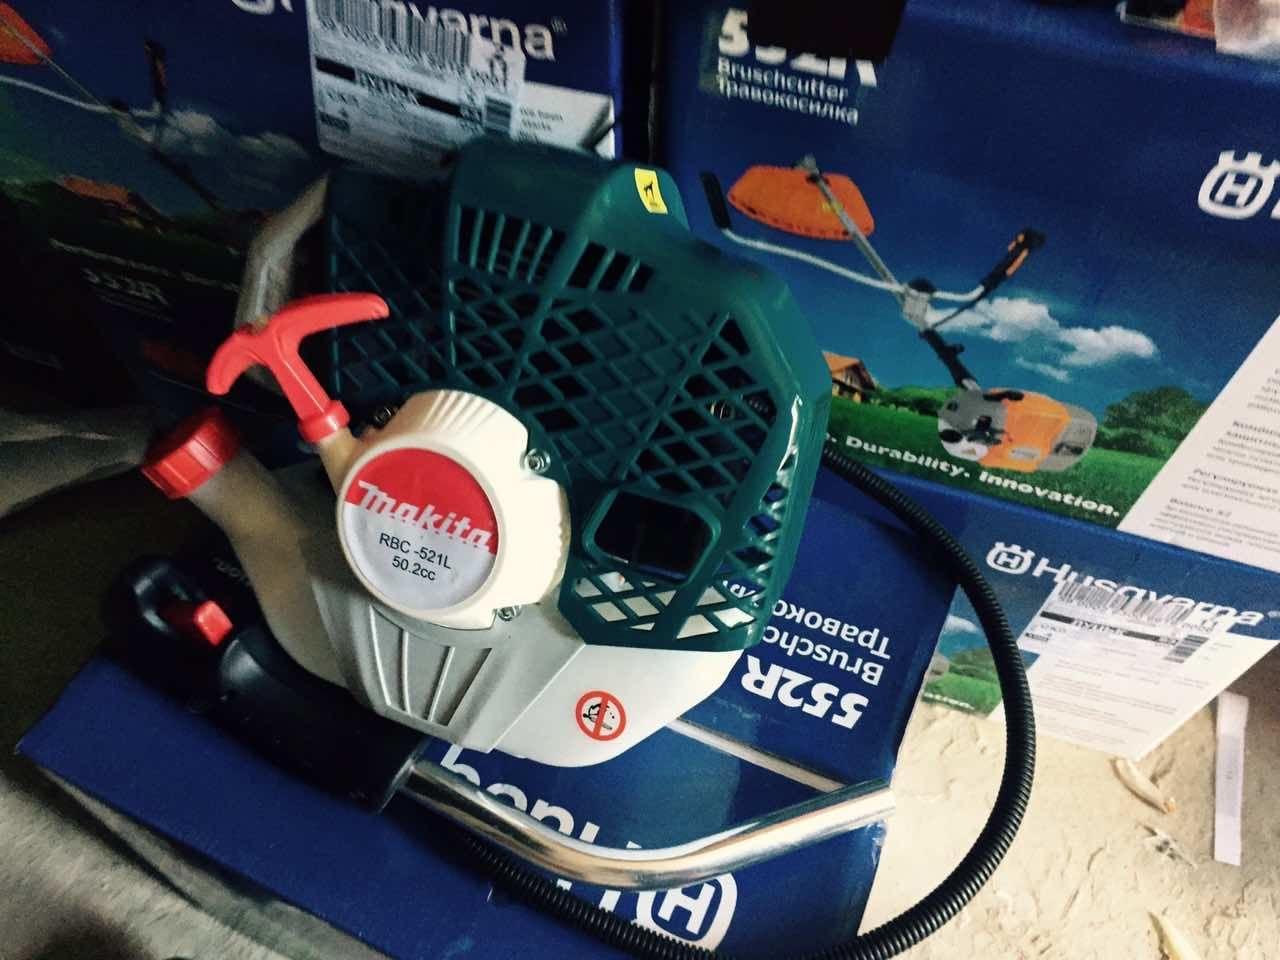 "Мотокоса (бензокосилка, кусторез) Makita RBC PRO 521 - Интернет магазин садовой техники"" Tehno-Haos "" техника для дома в Луцке"